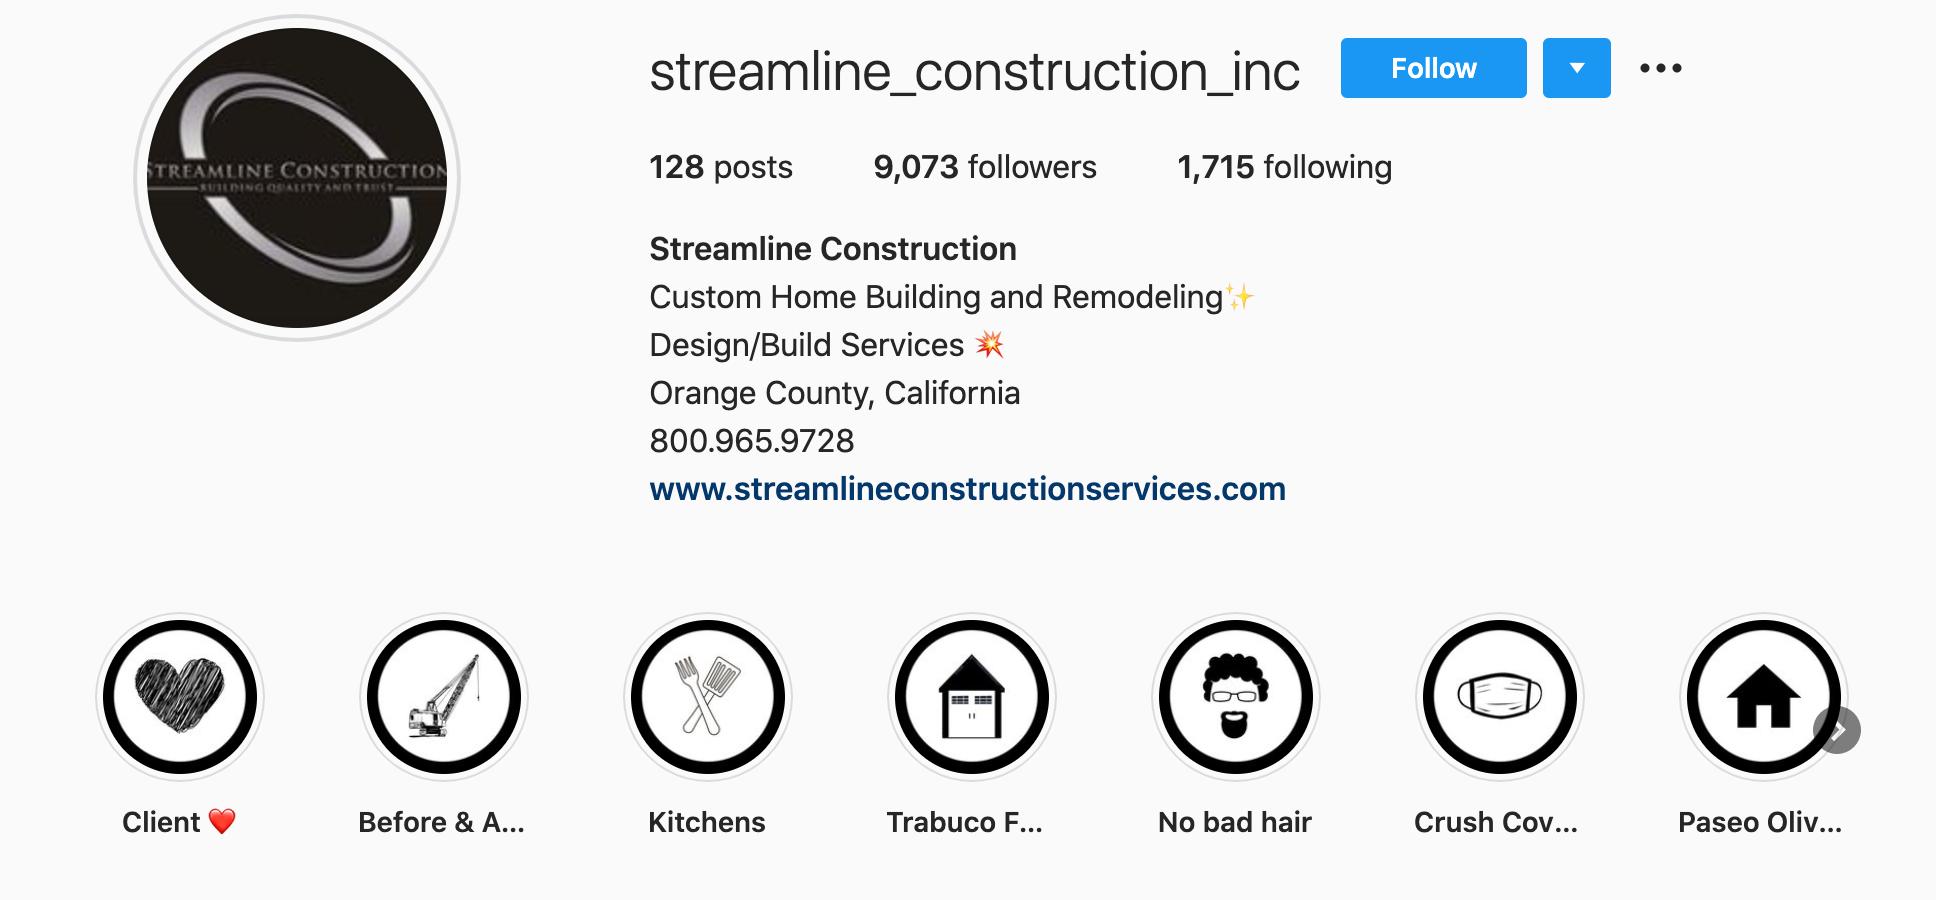 streamline-construction-inc-instagram-profile